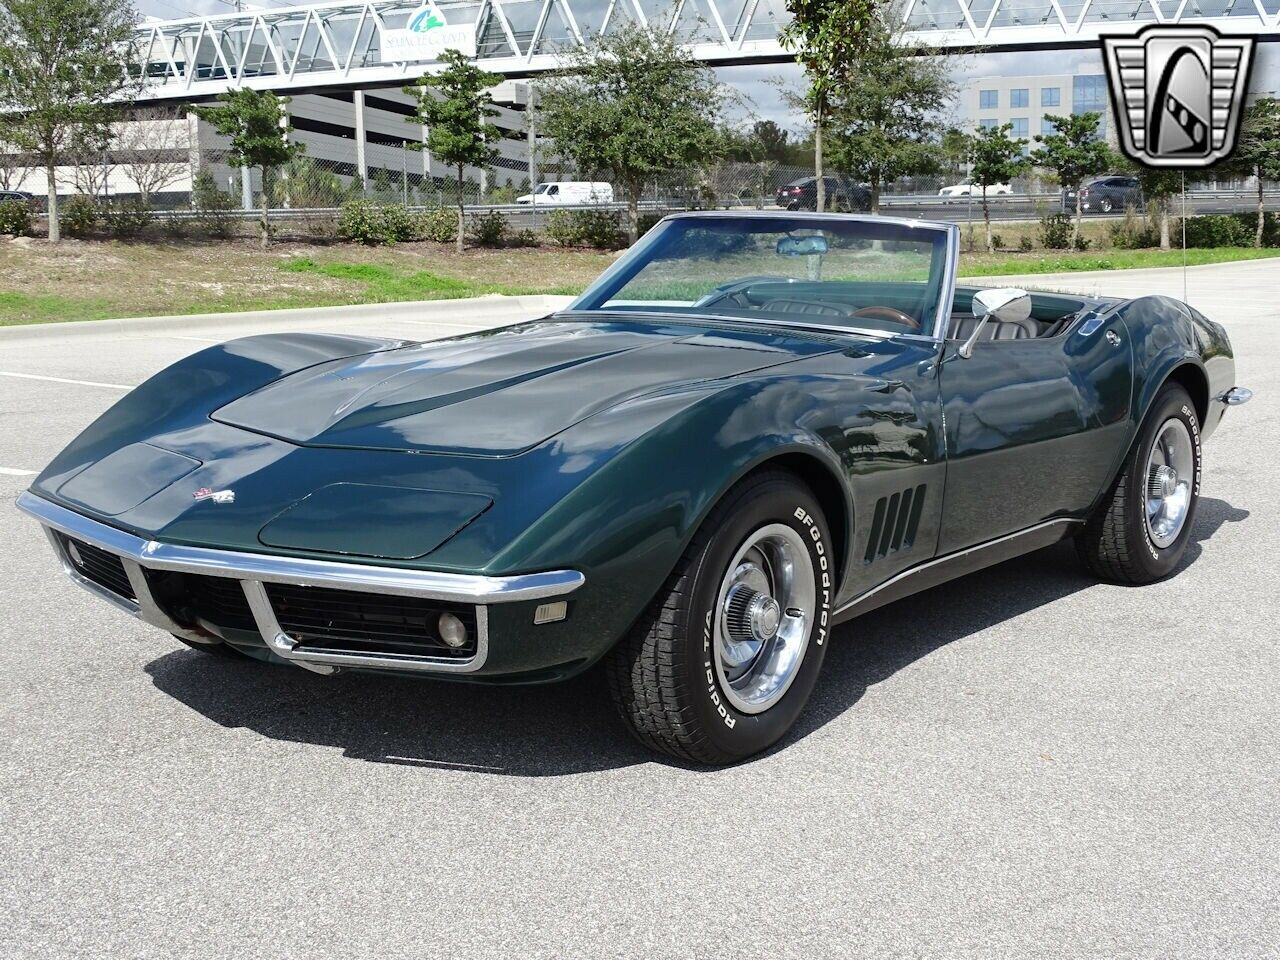 1968 Green Chevrolet Corvette   | C3 Corvette Photo 5